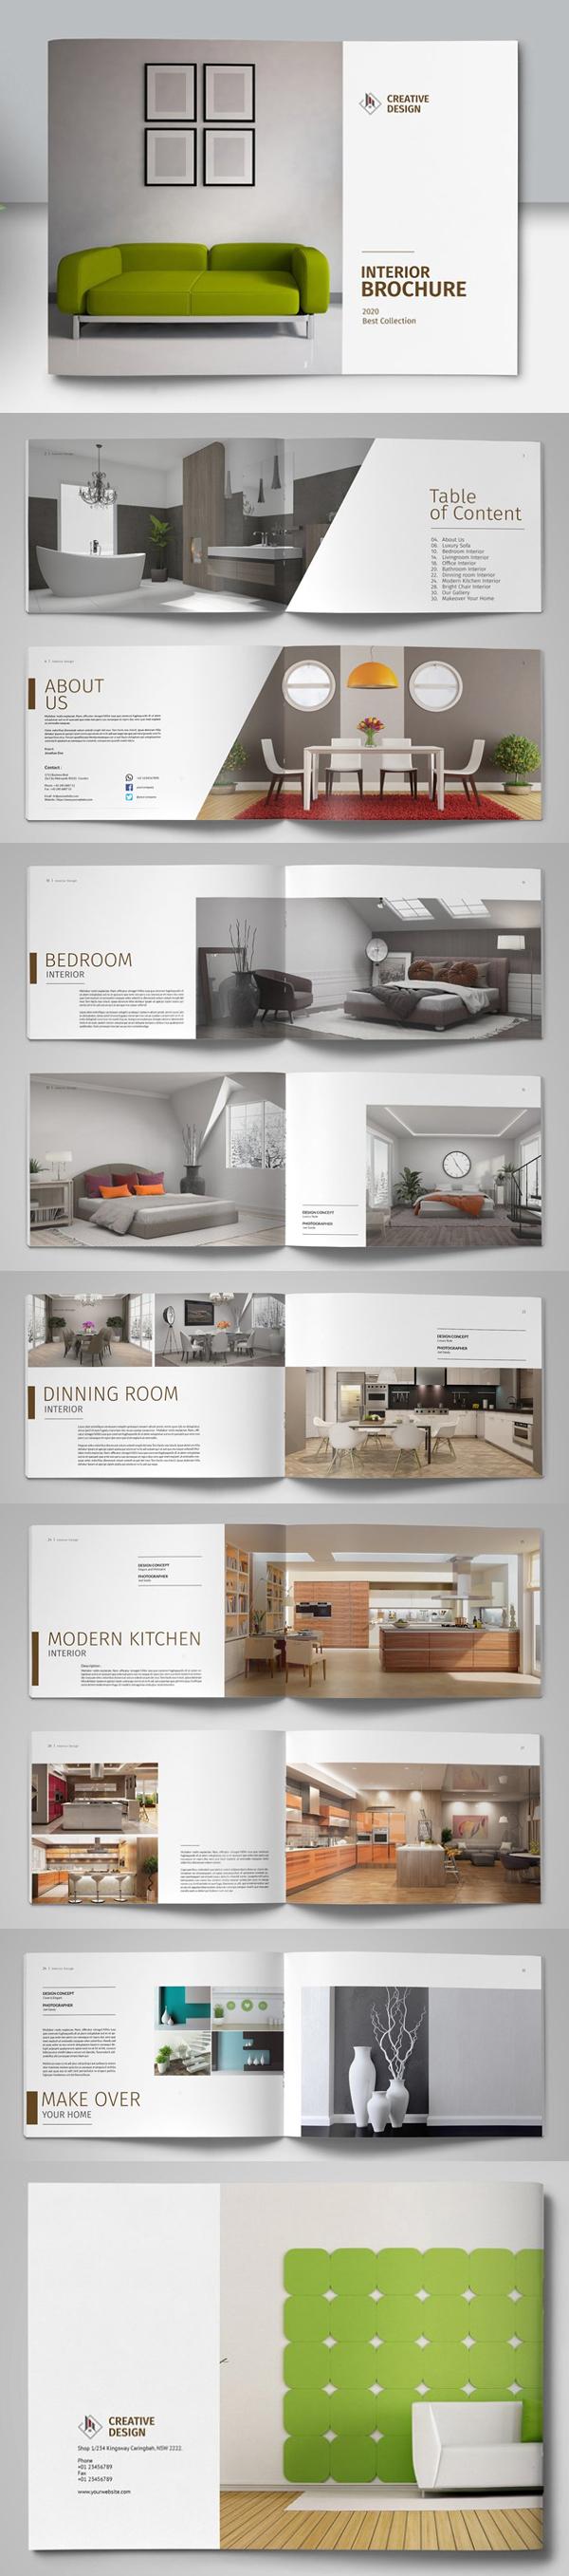 Brochure Catalog Design Template